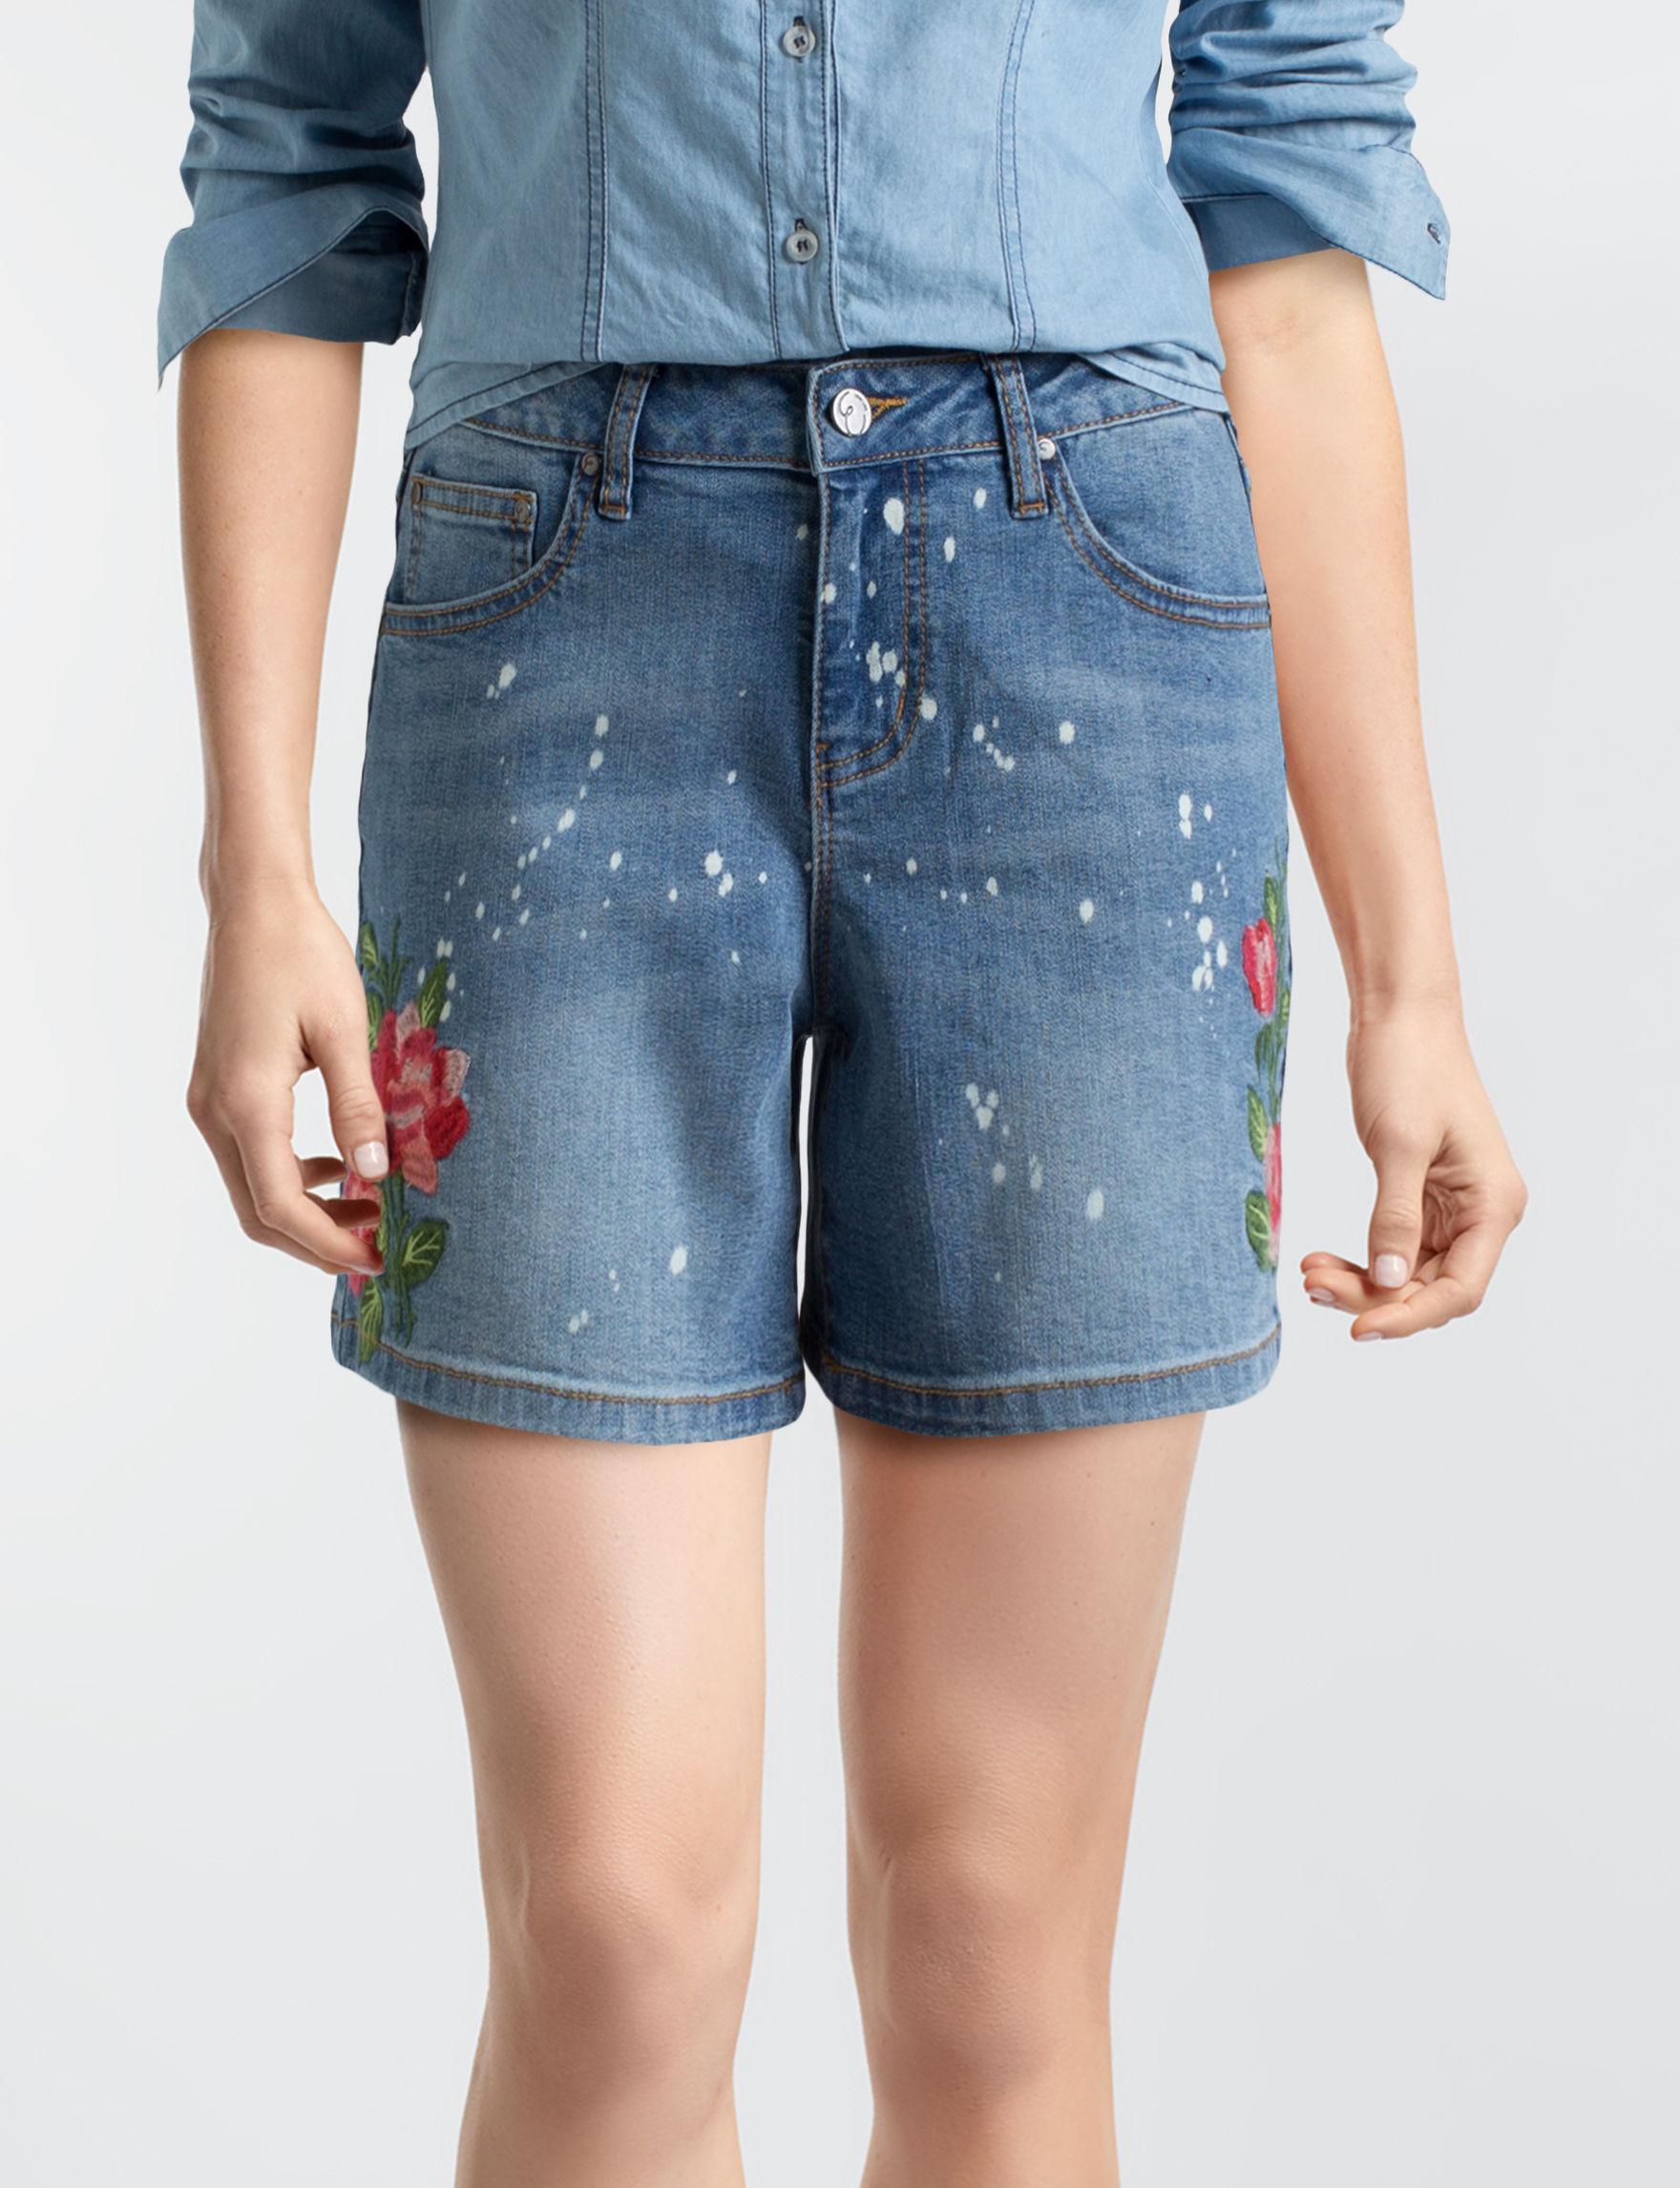 Earl Jean Blue Denim Shorts